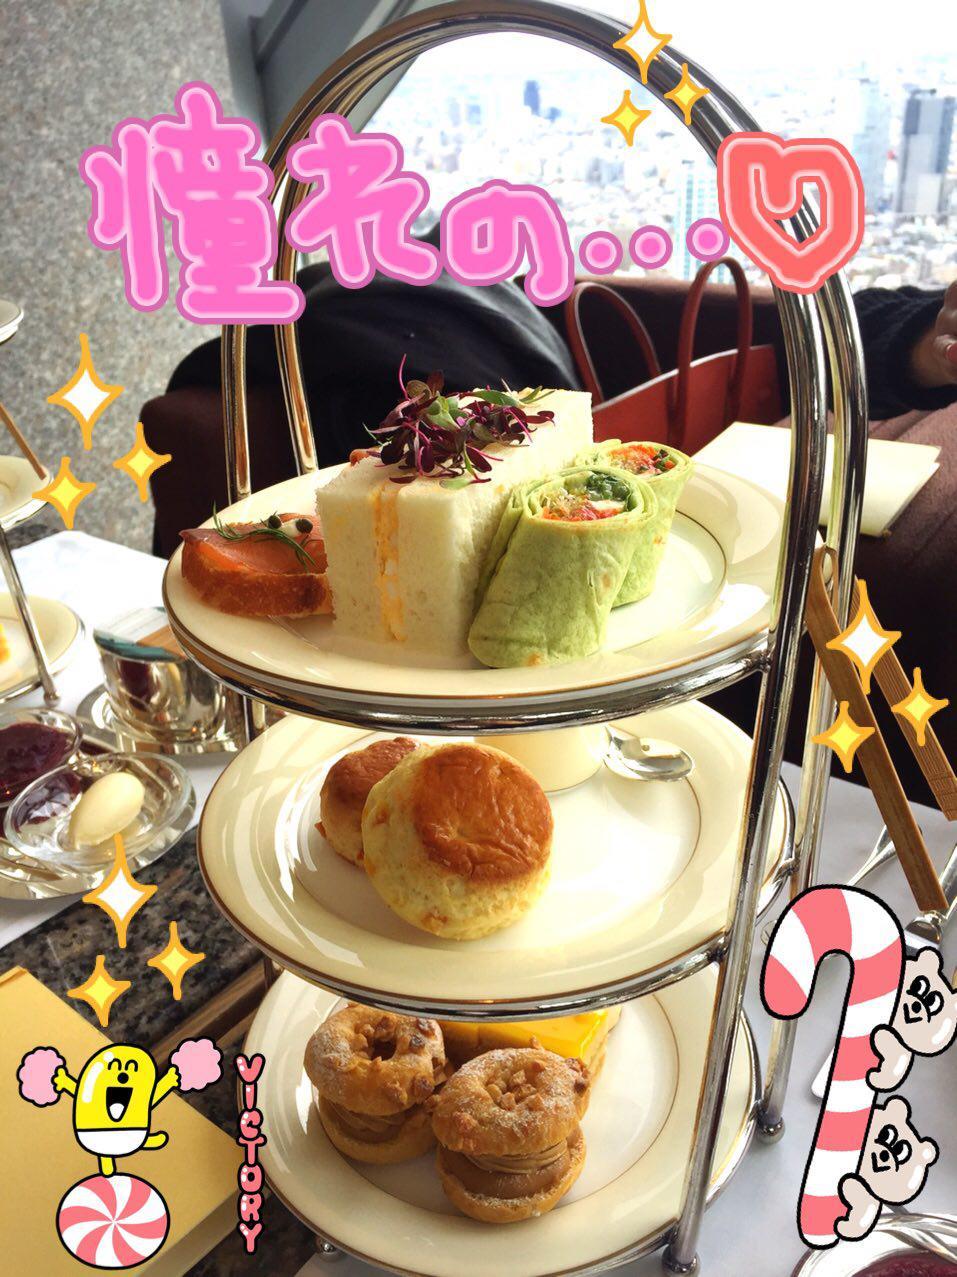 photo_2017-04-01_00-14-25.jpg